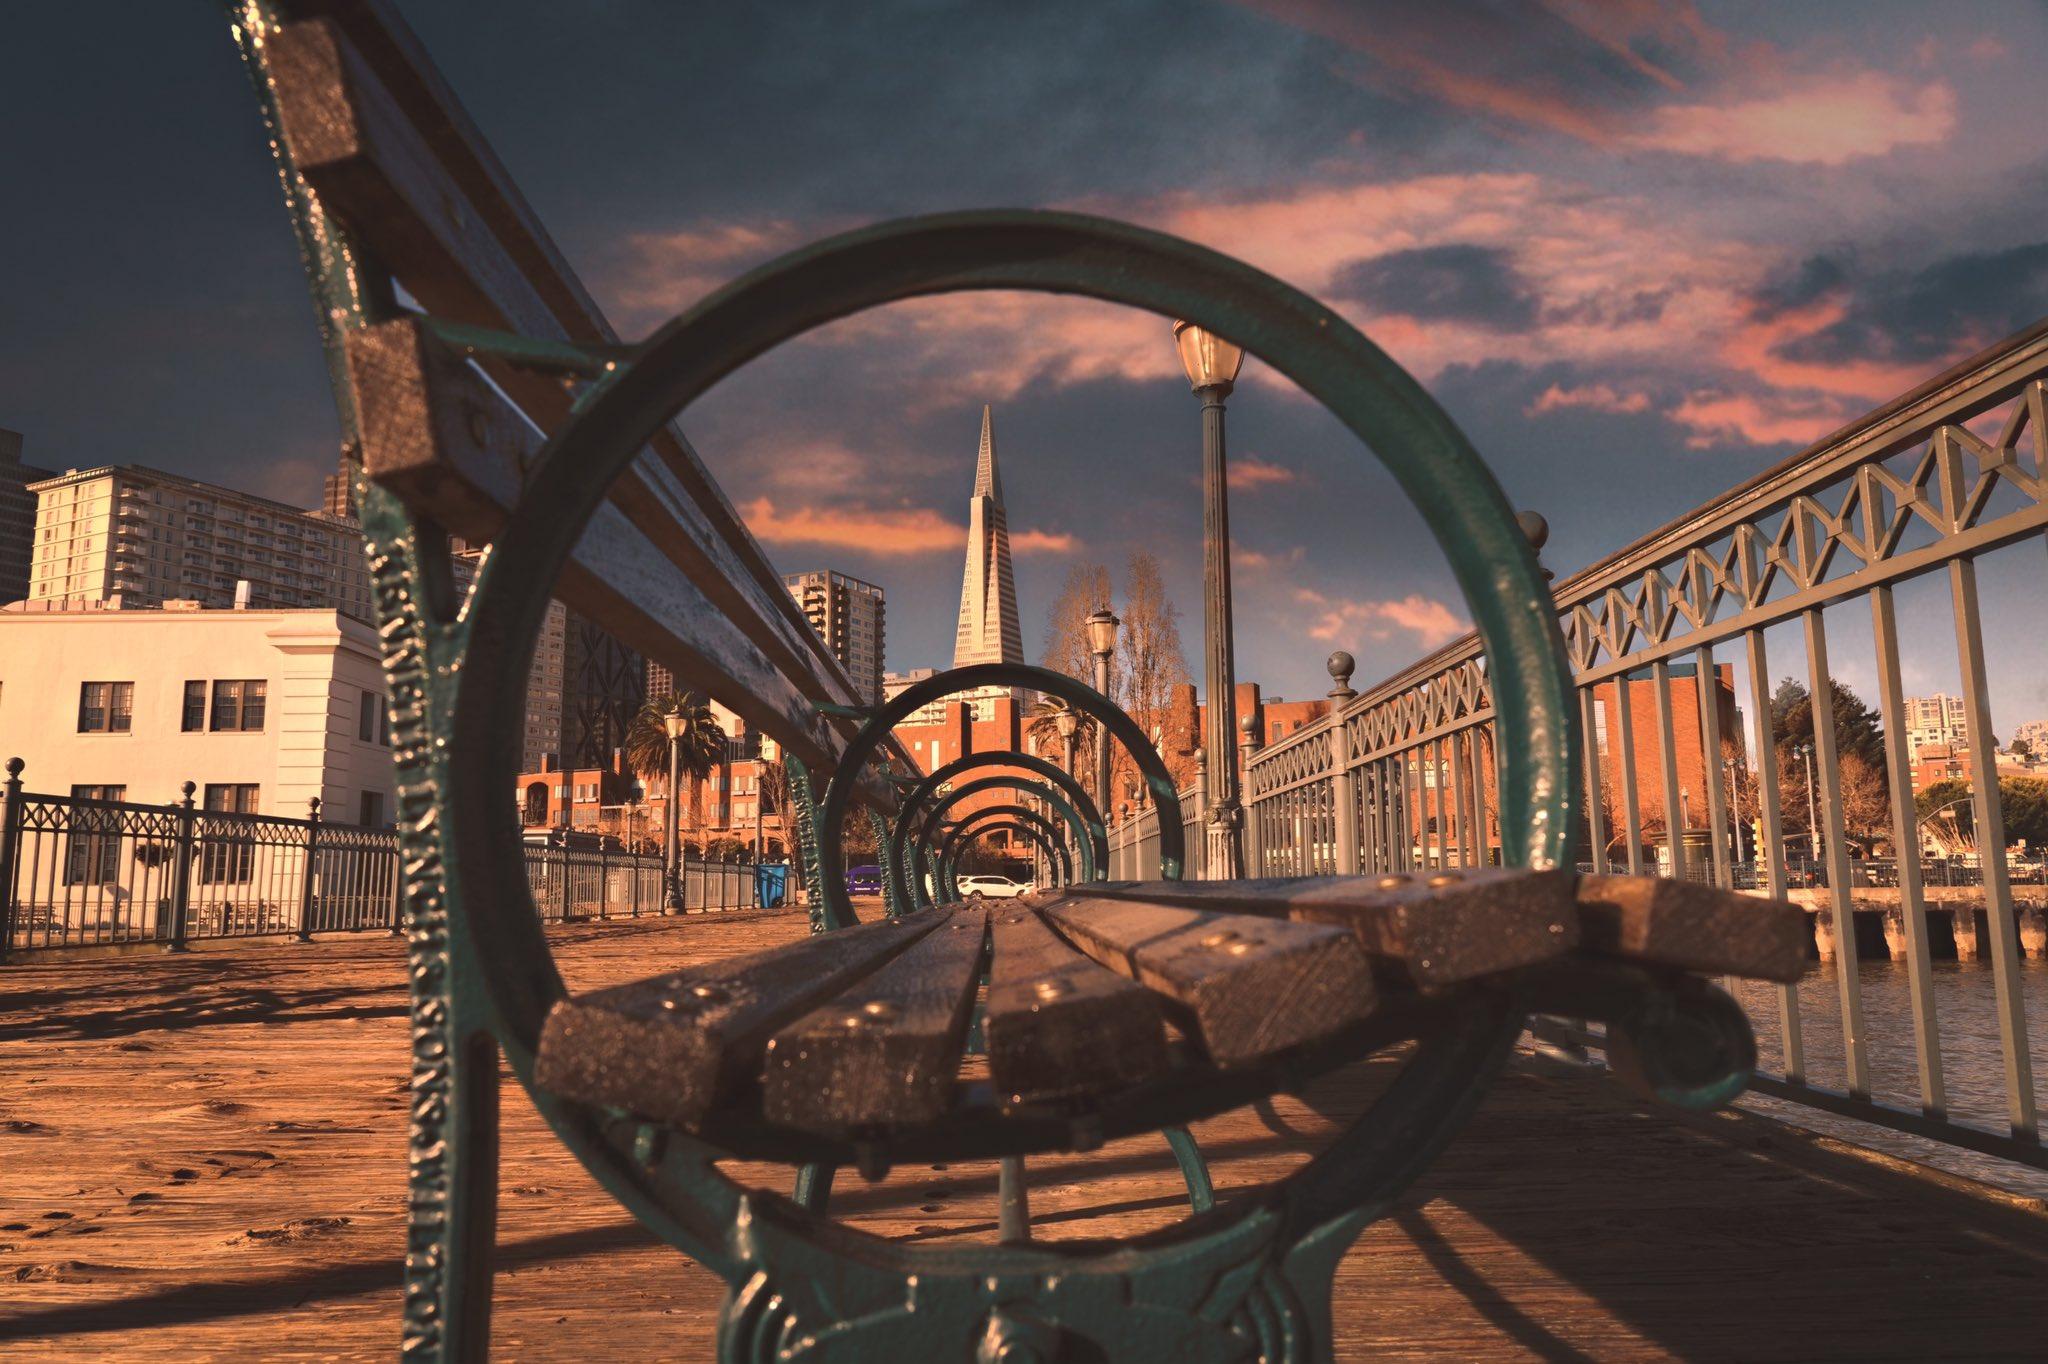 urban_street_photography_39.jpg